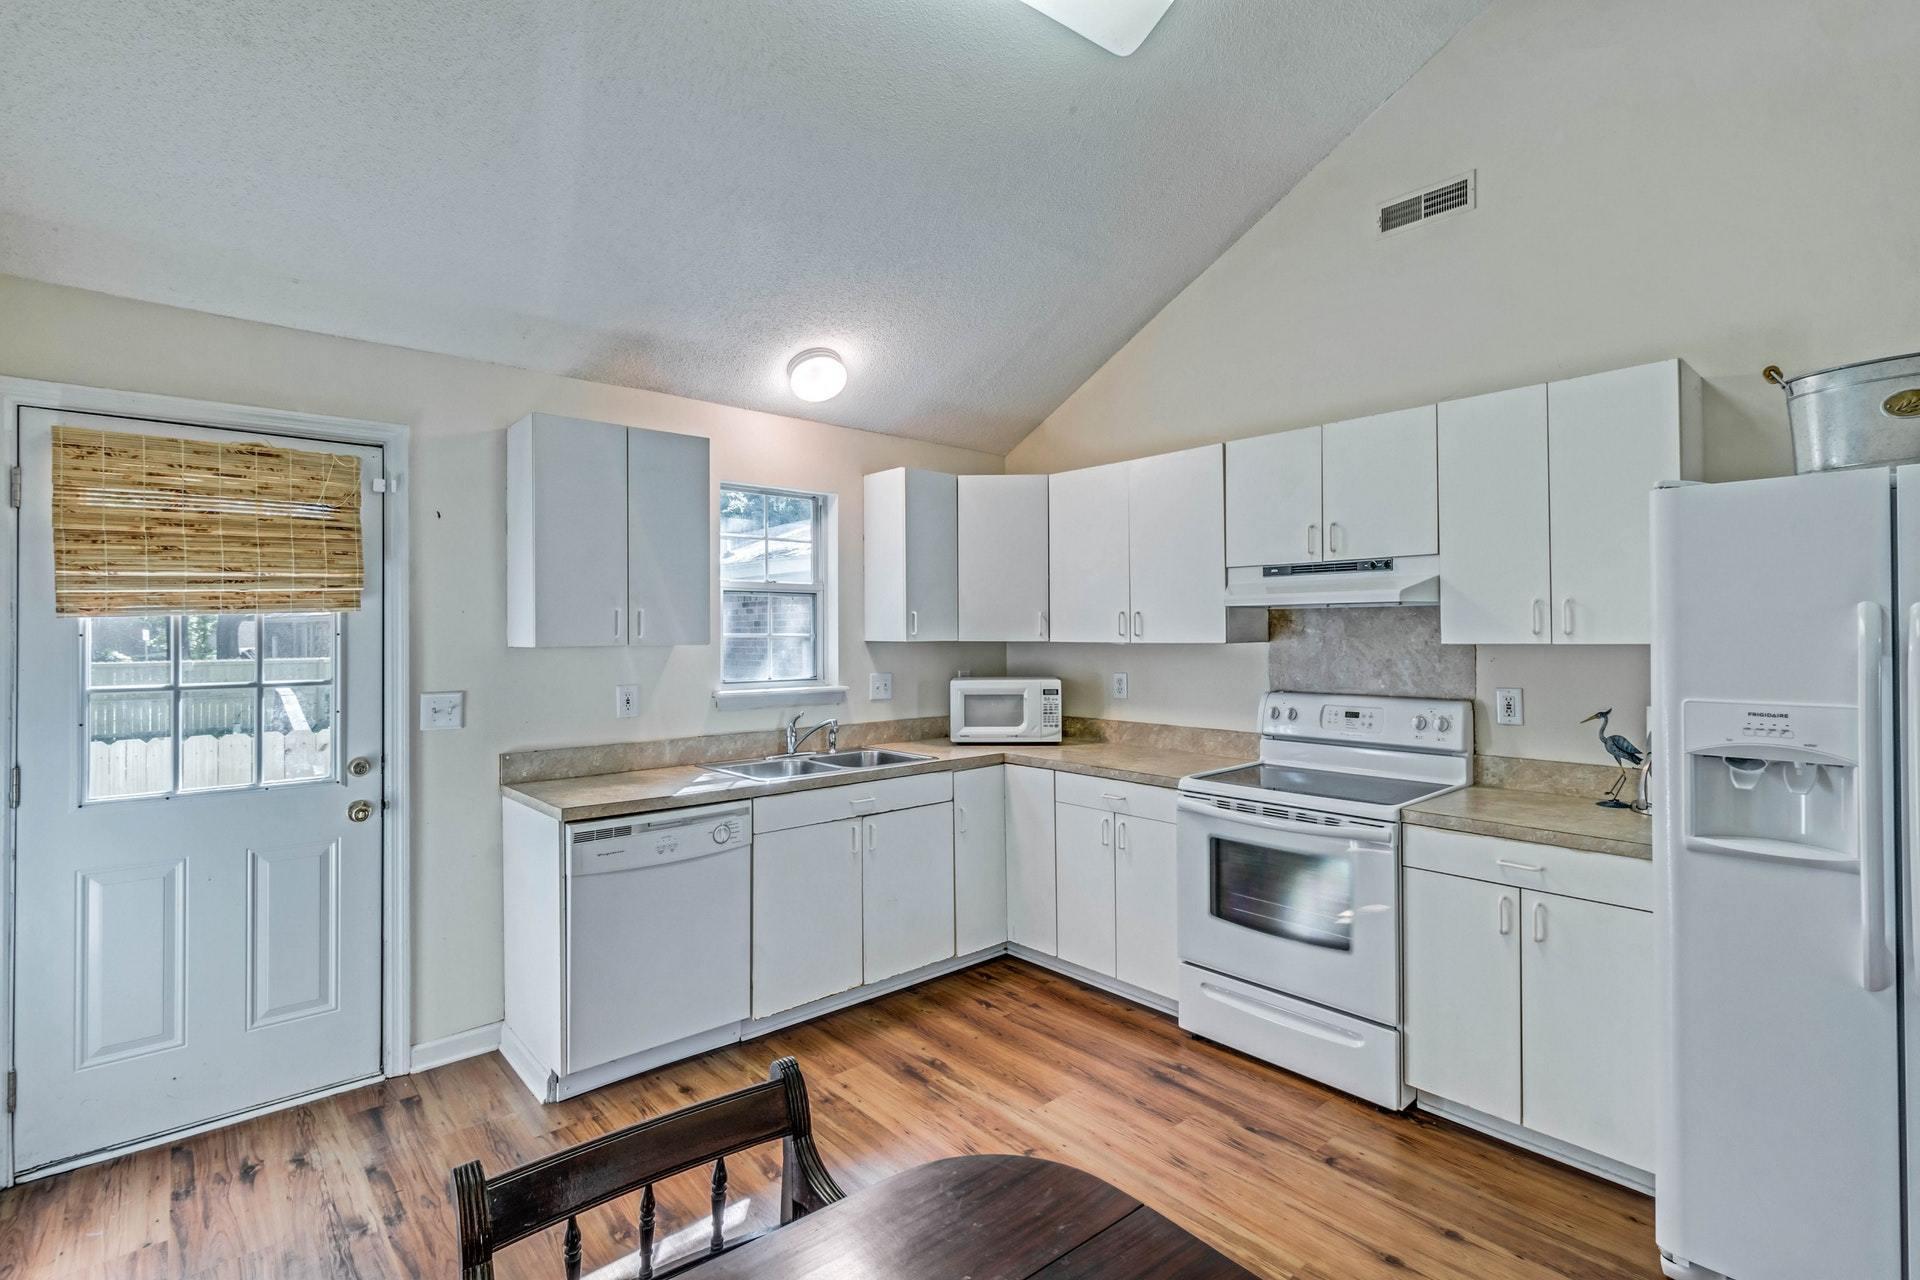 Double Oaks Homes For Sale - 2402 Double Oak, Charleston, SC - 6